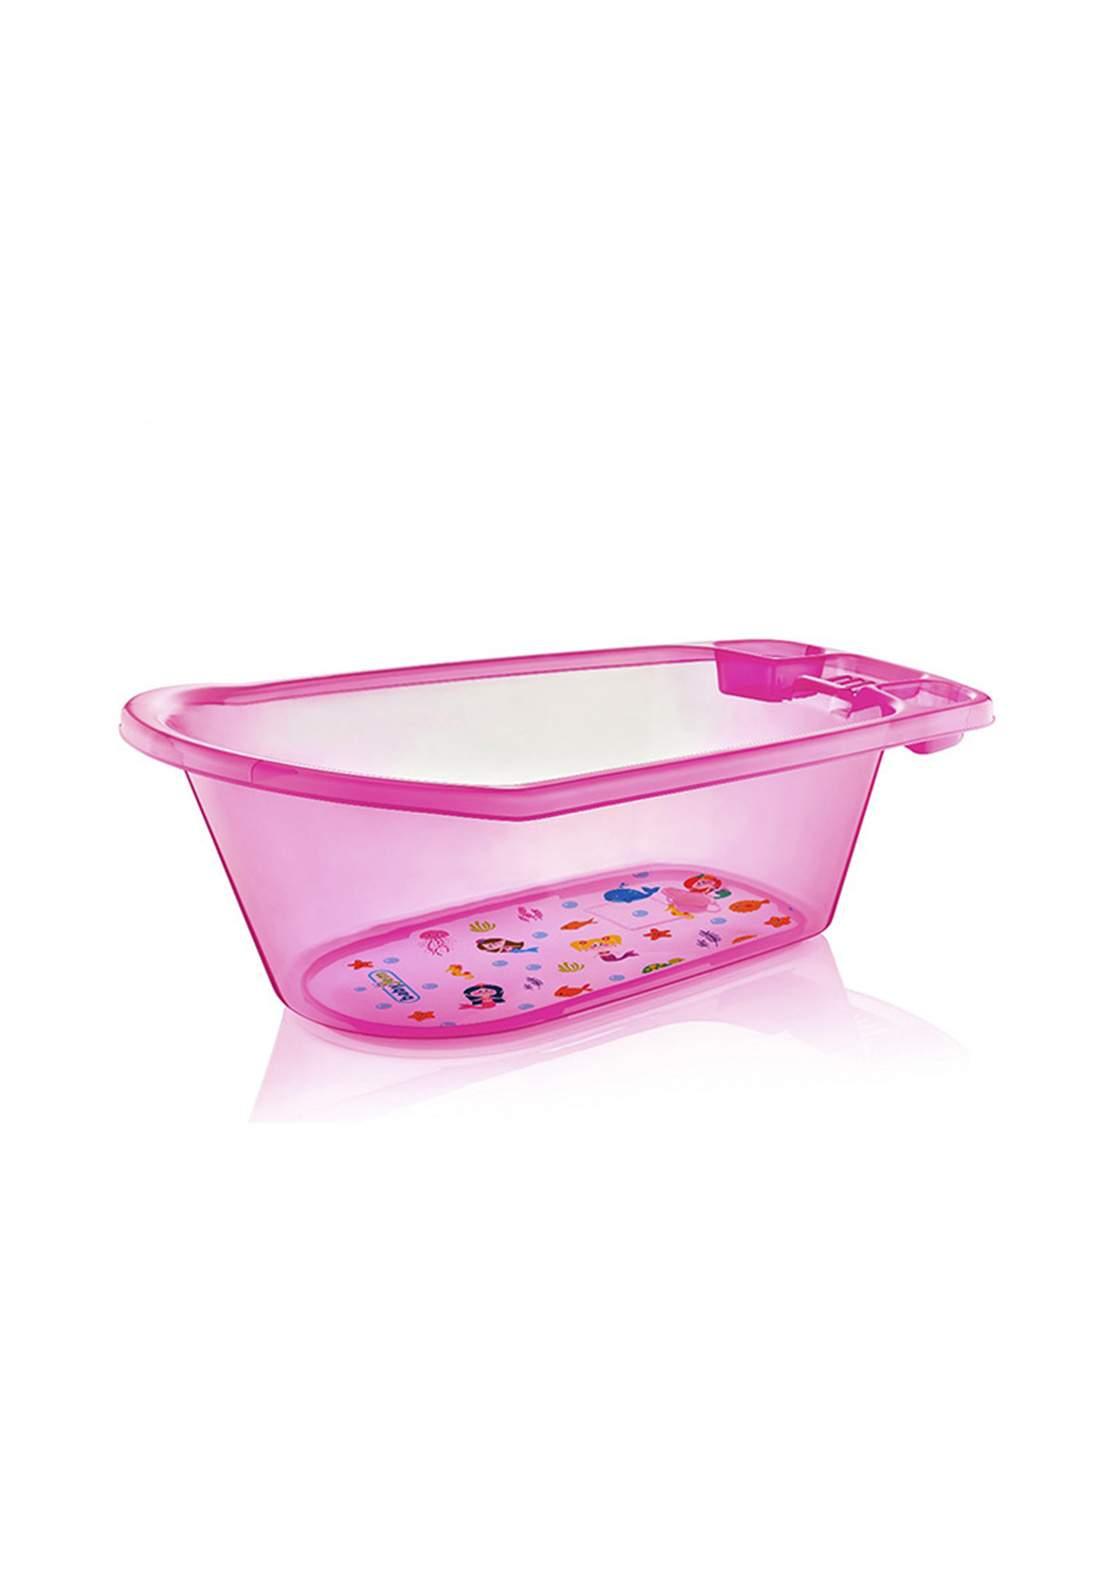 Babyjem 001 Baby Bathtubحوض استحمام للاطفال